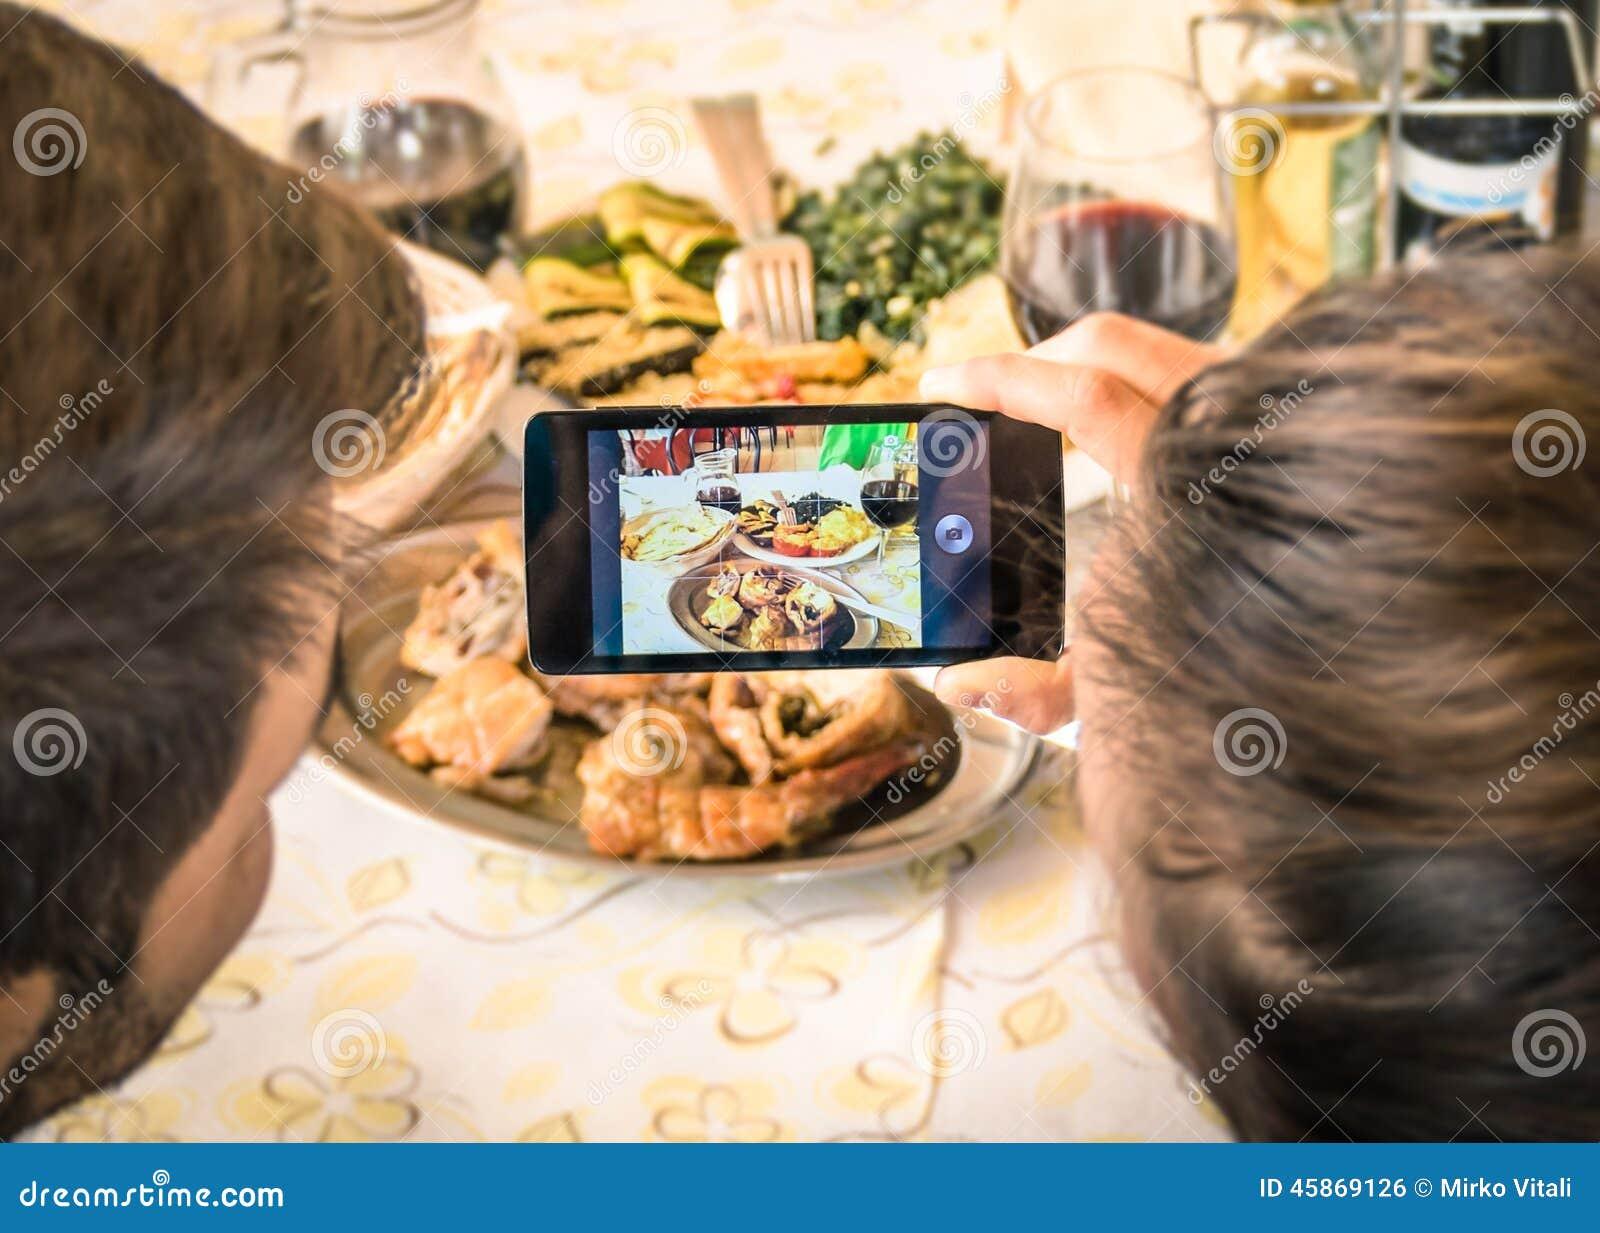 Couple of boyfriend and girlfriend taking a food selfie